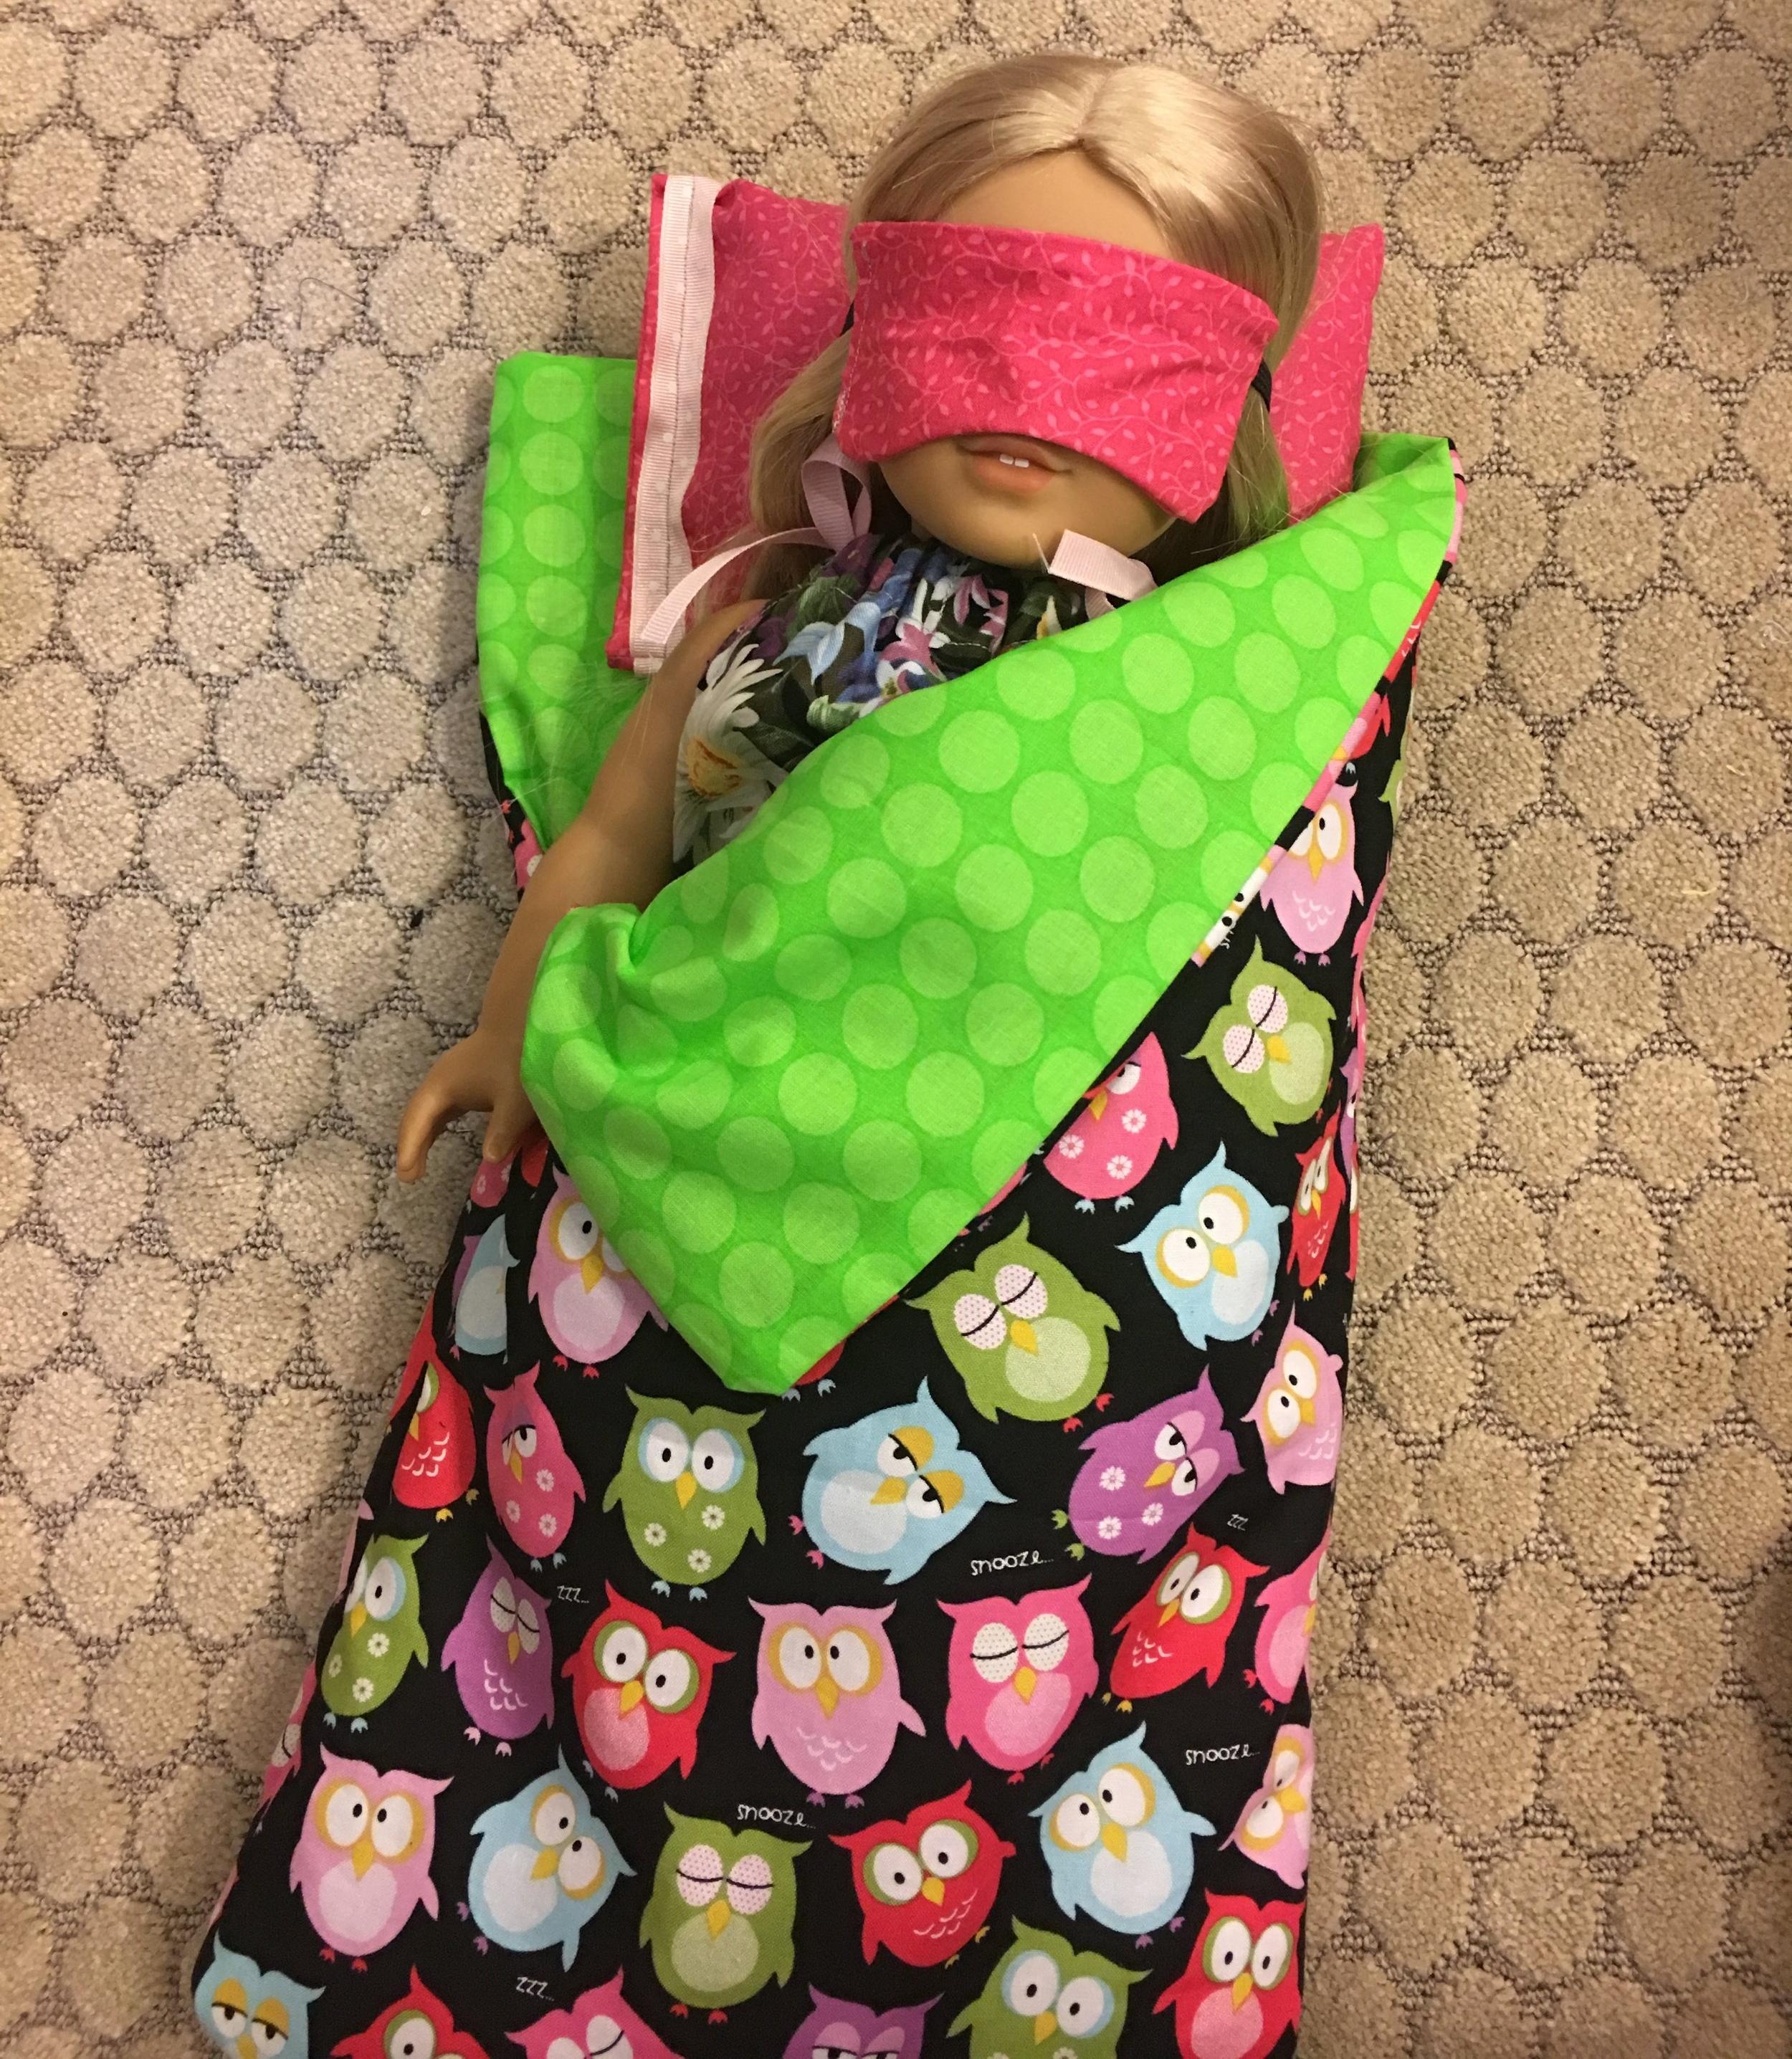 doll sleeping bag.JPG